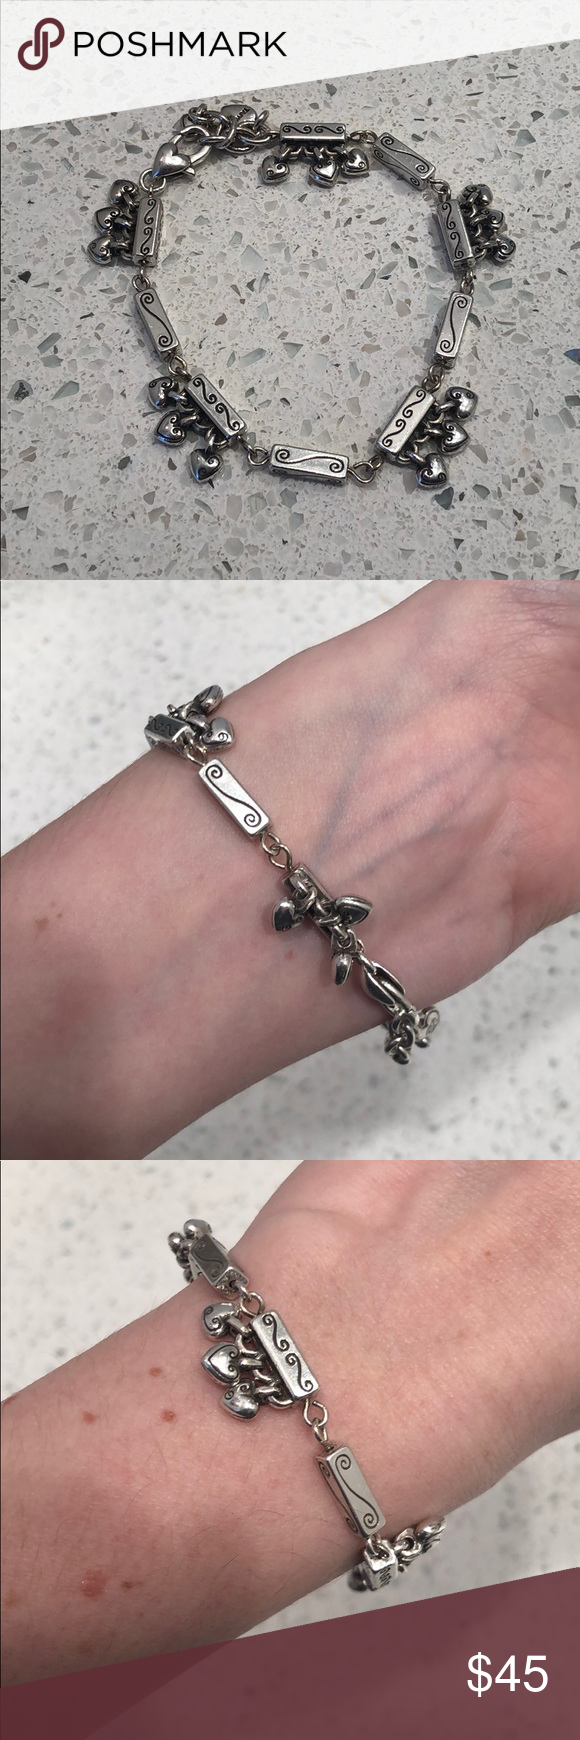 Unique Brighton dangling heart bracelet EUC. 5 sets of 3 dangling hearts.  Measu…